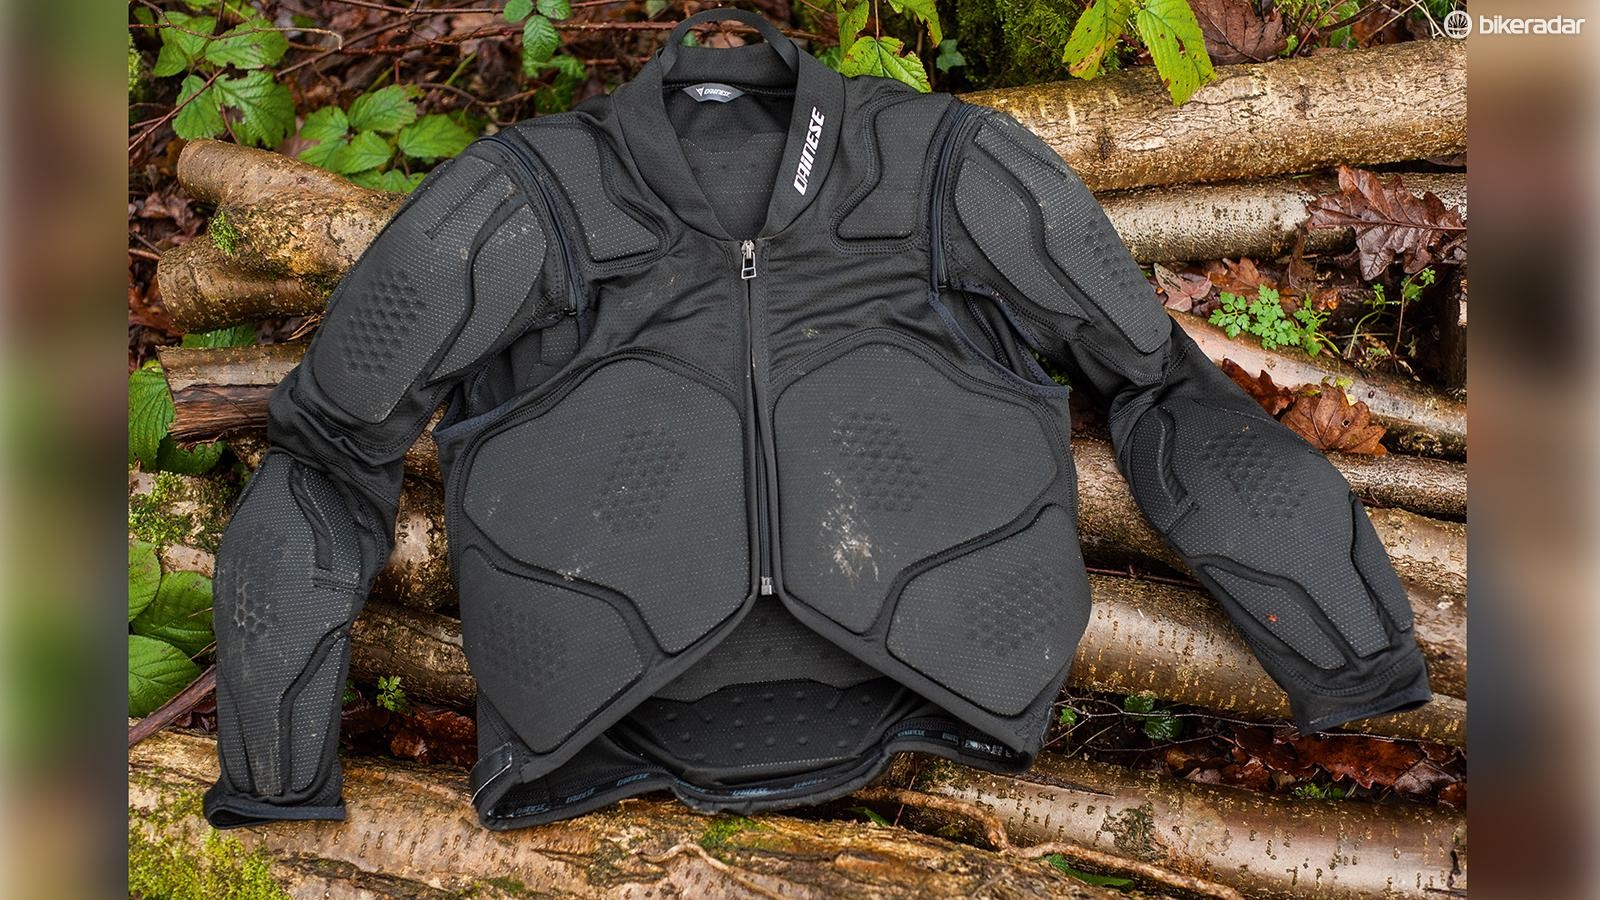 Dainese Rhyolite armour jacket